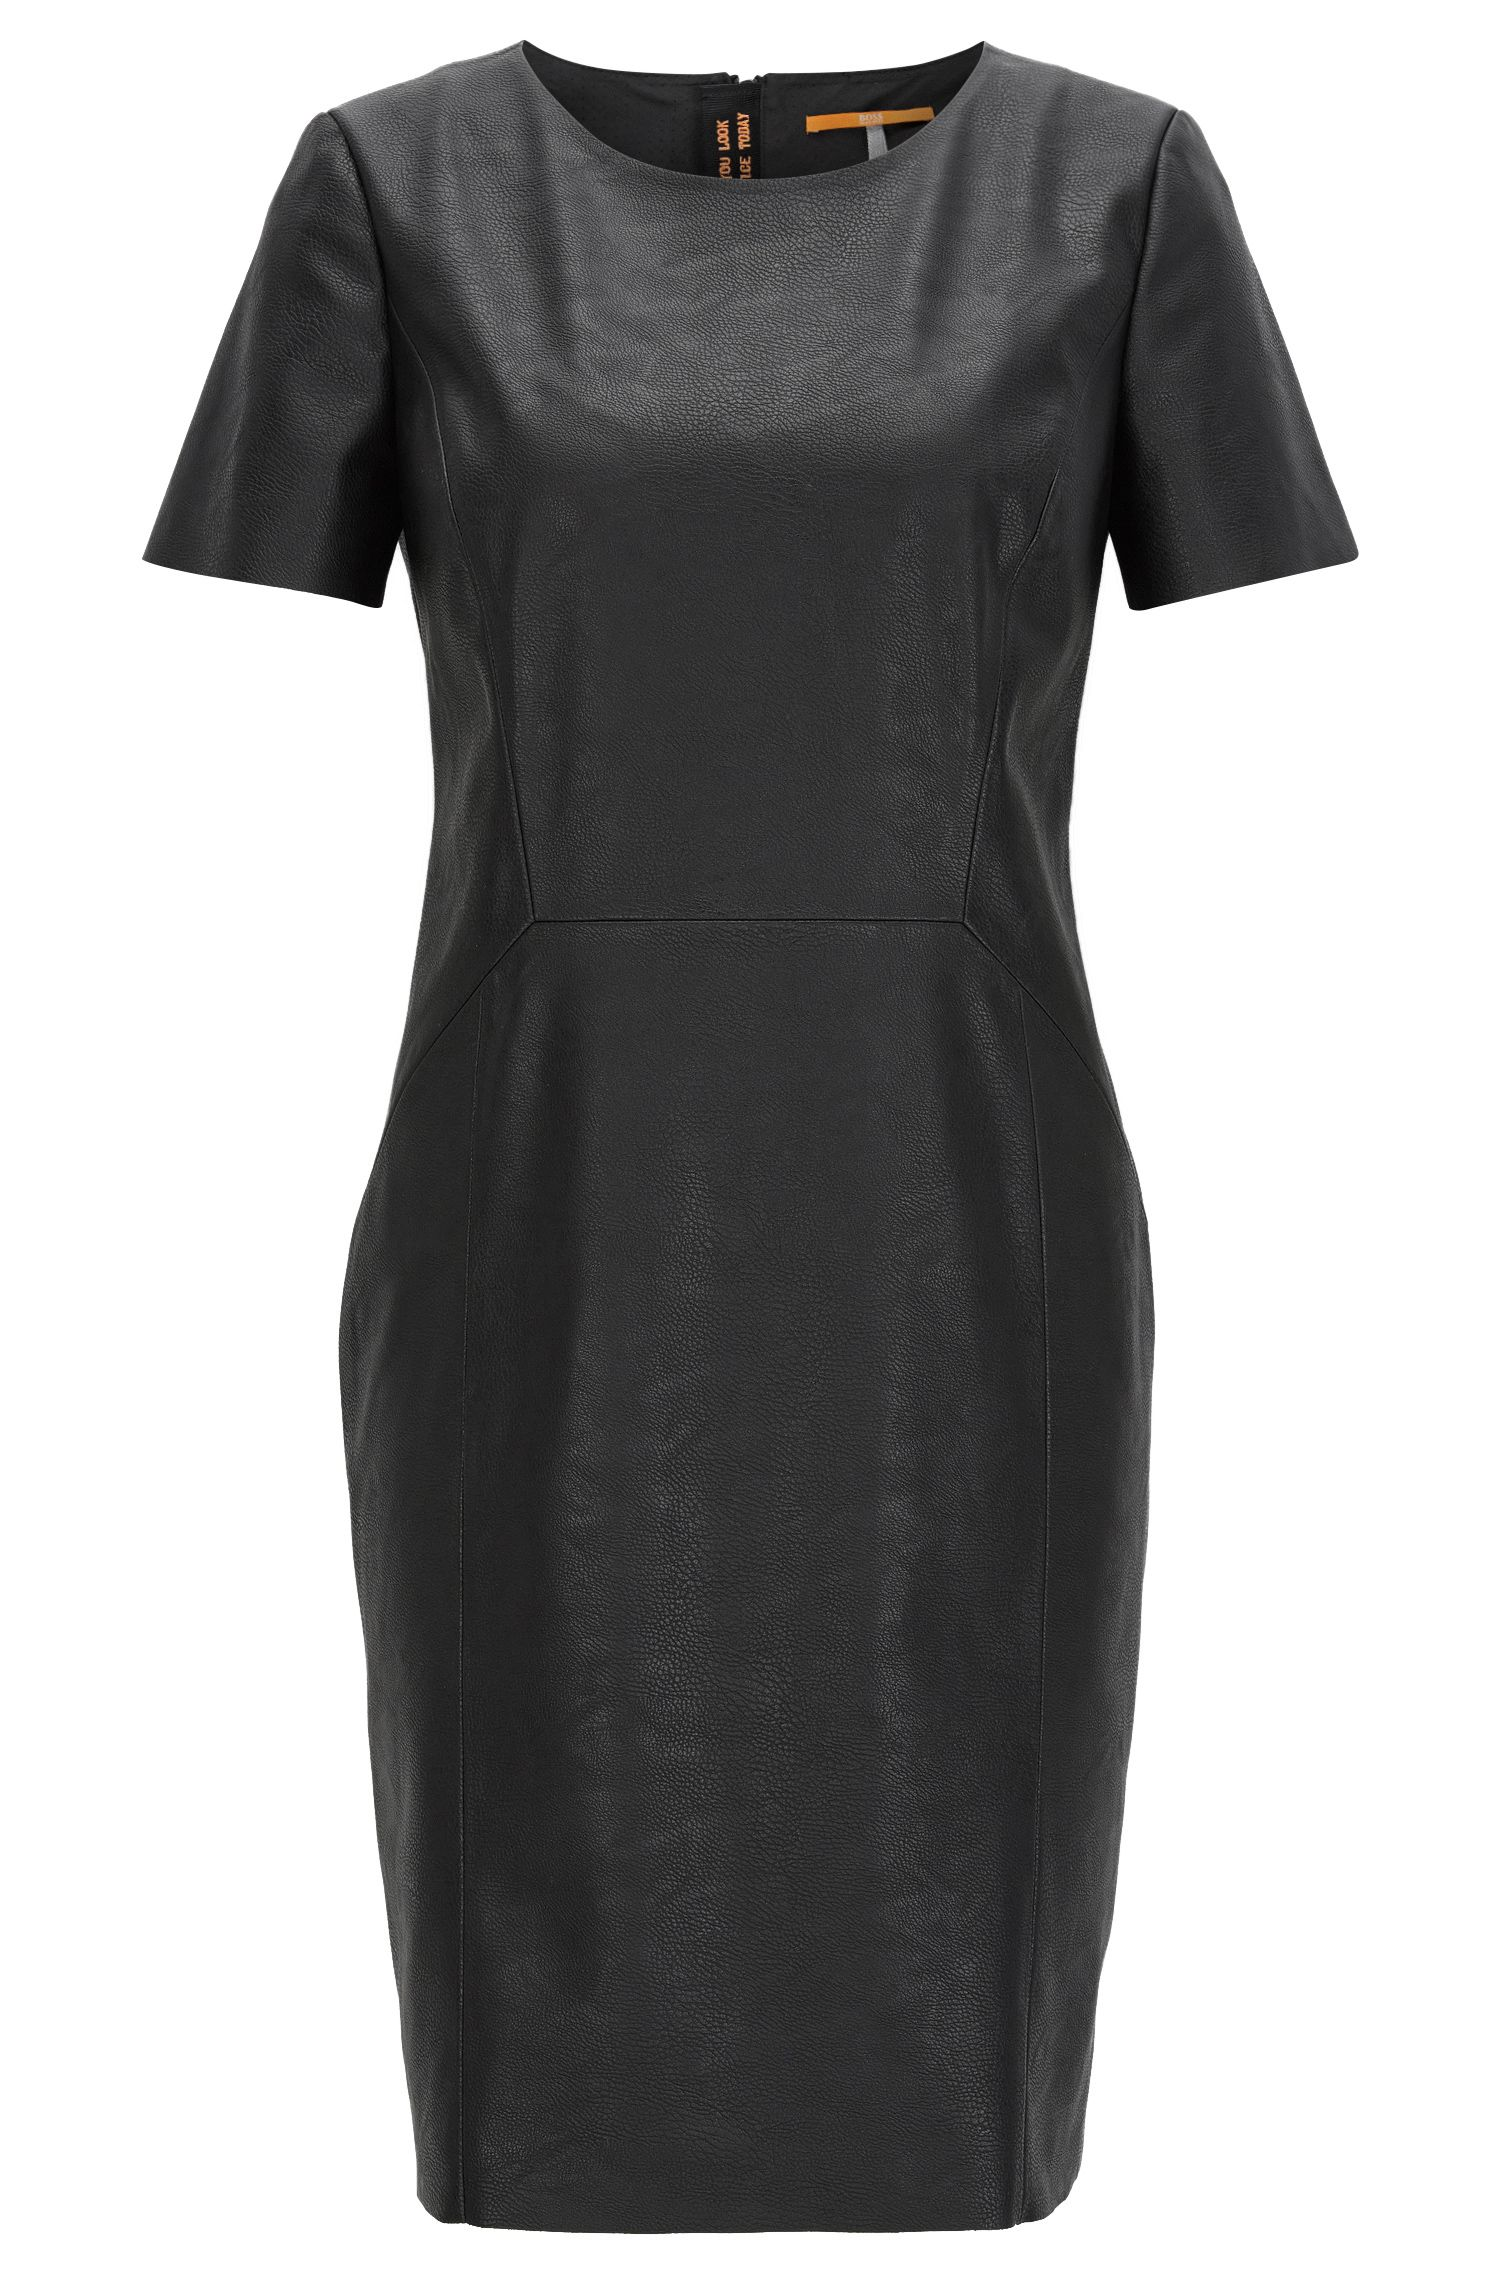 'Aledy' | Faux Leather Sheath Dress